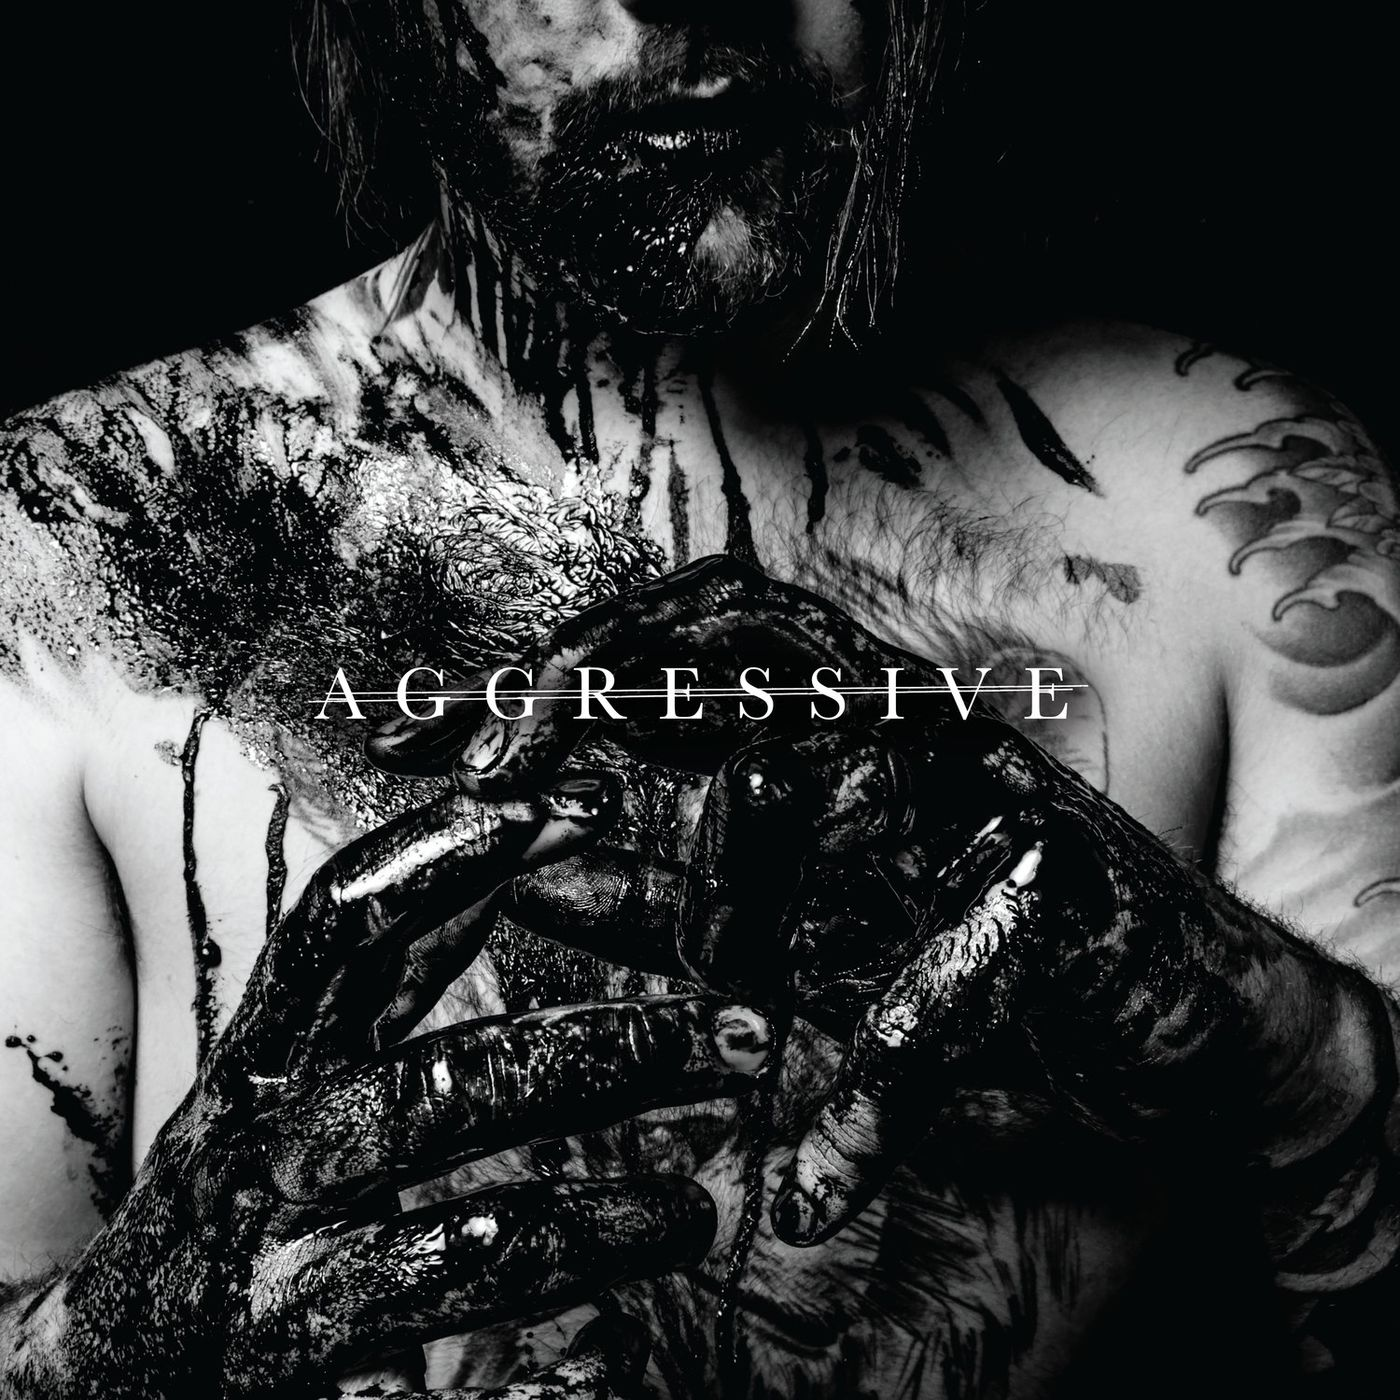 Beartooth - Aggressive (Remixed/Remastered) (2020)